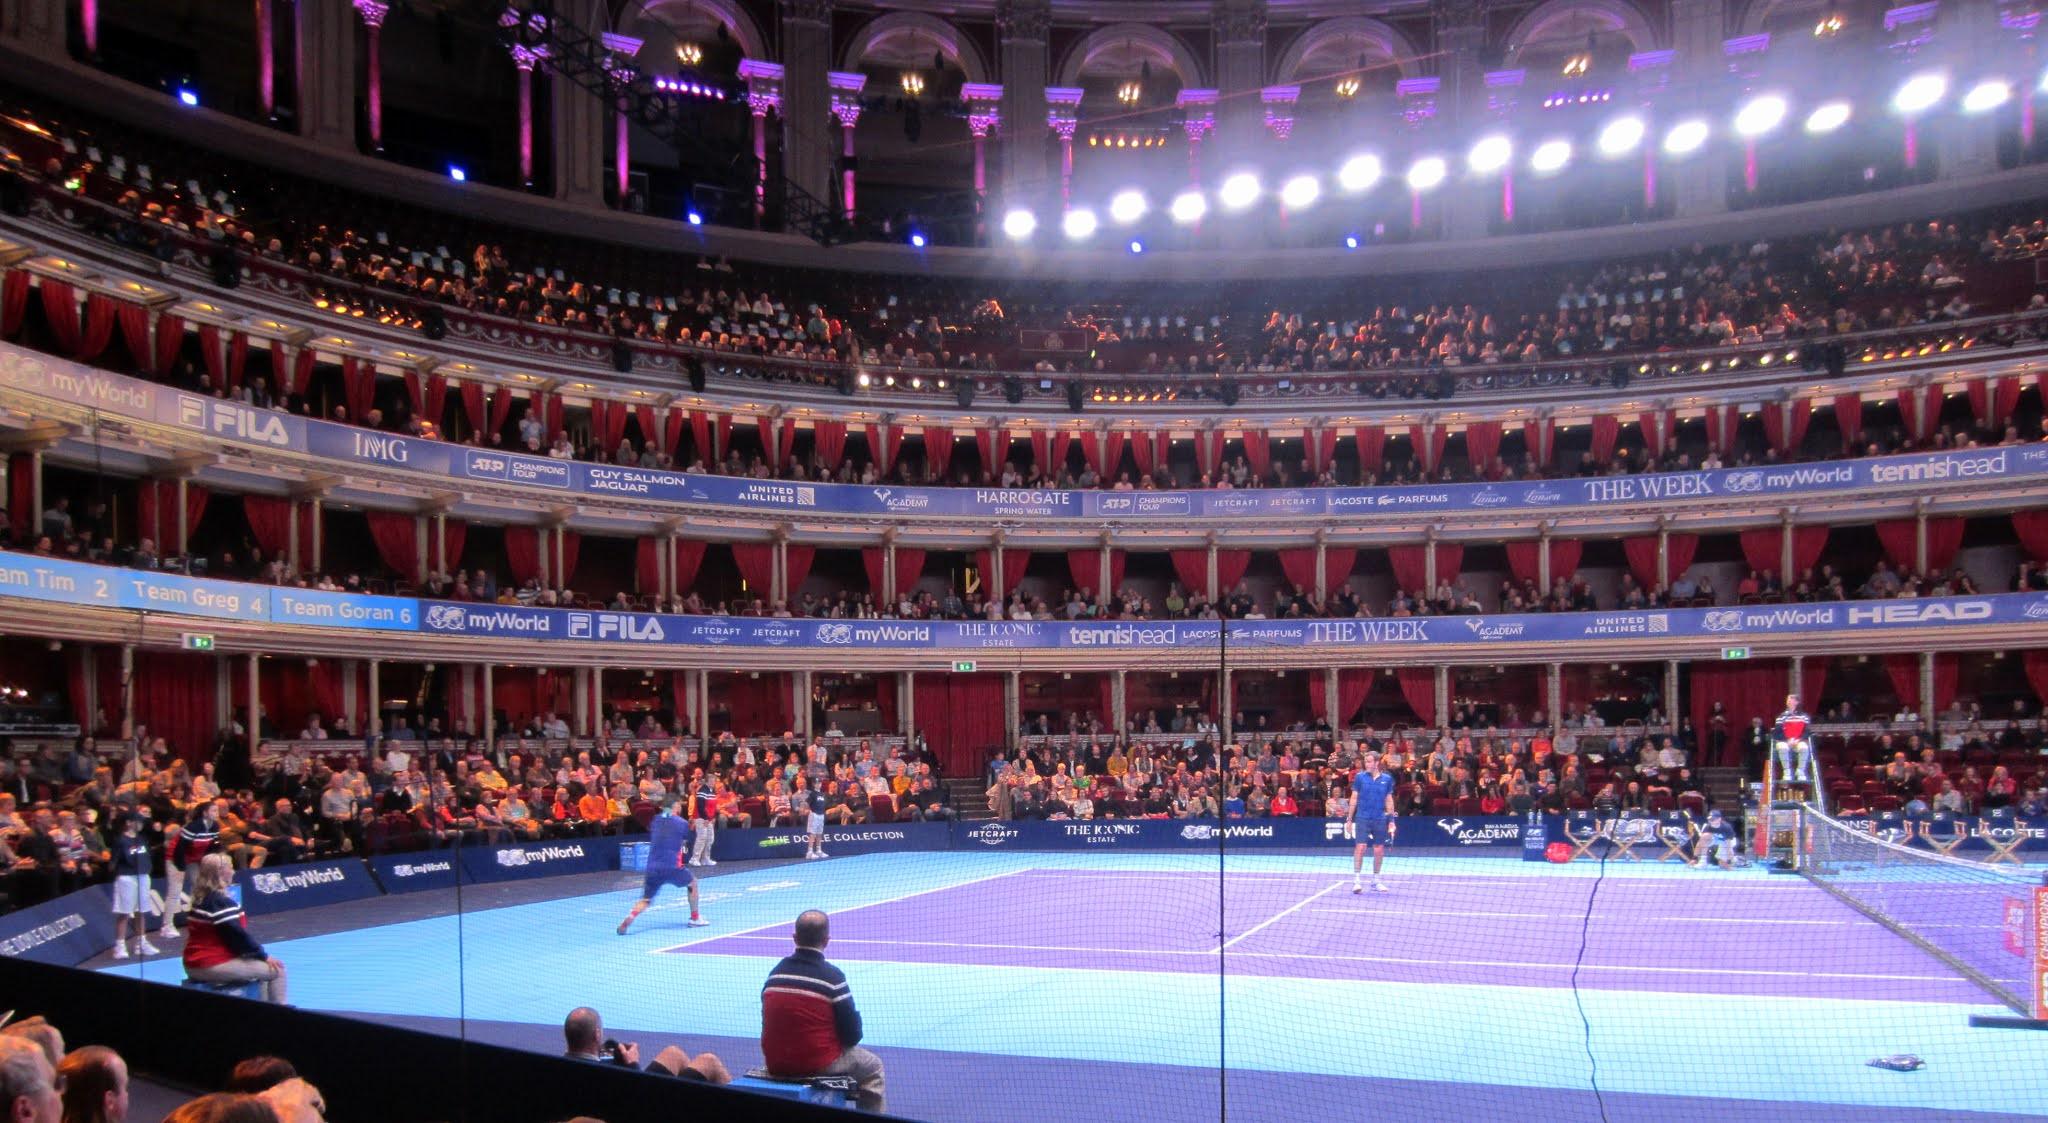 Marcos Baghdatis strikes a backhand at myWorld Champions Tennis